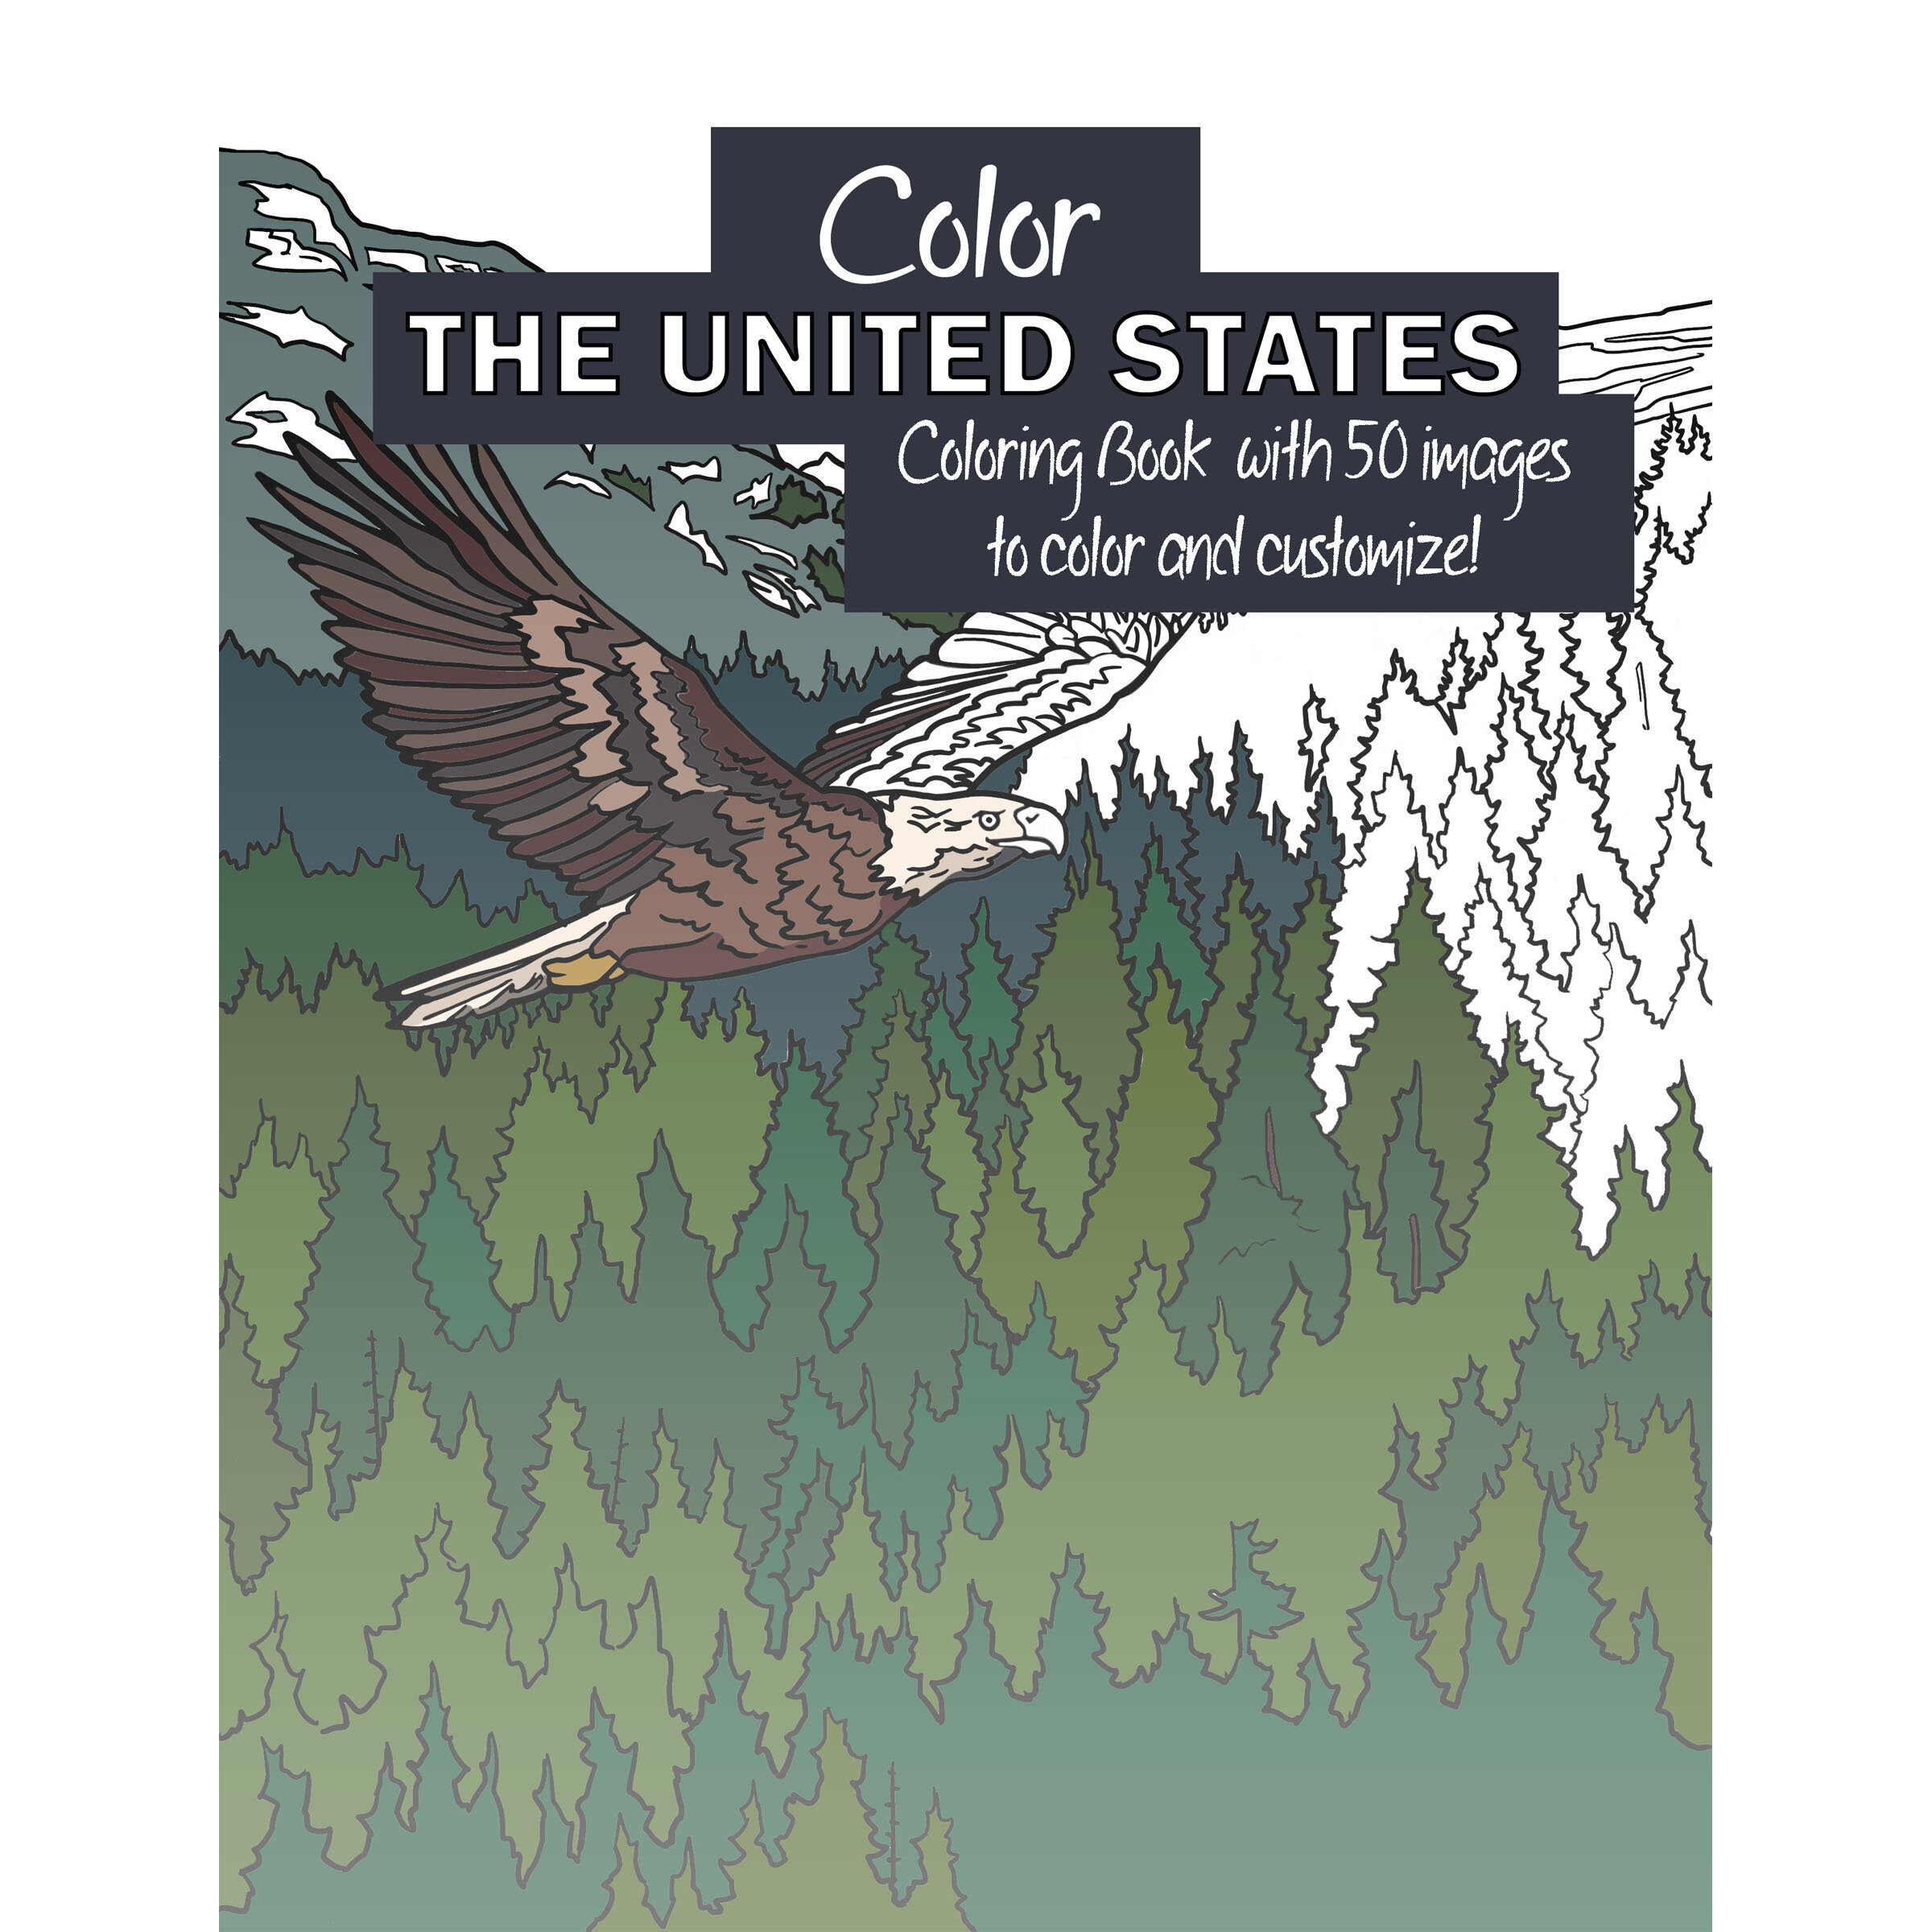 Color The United States Coloring Book (digital Version) — CORVIDAE Drawings  & Designs